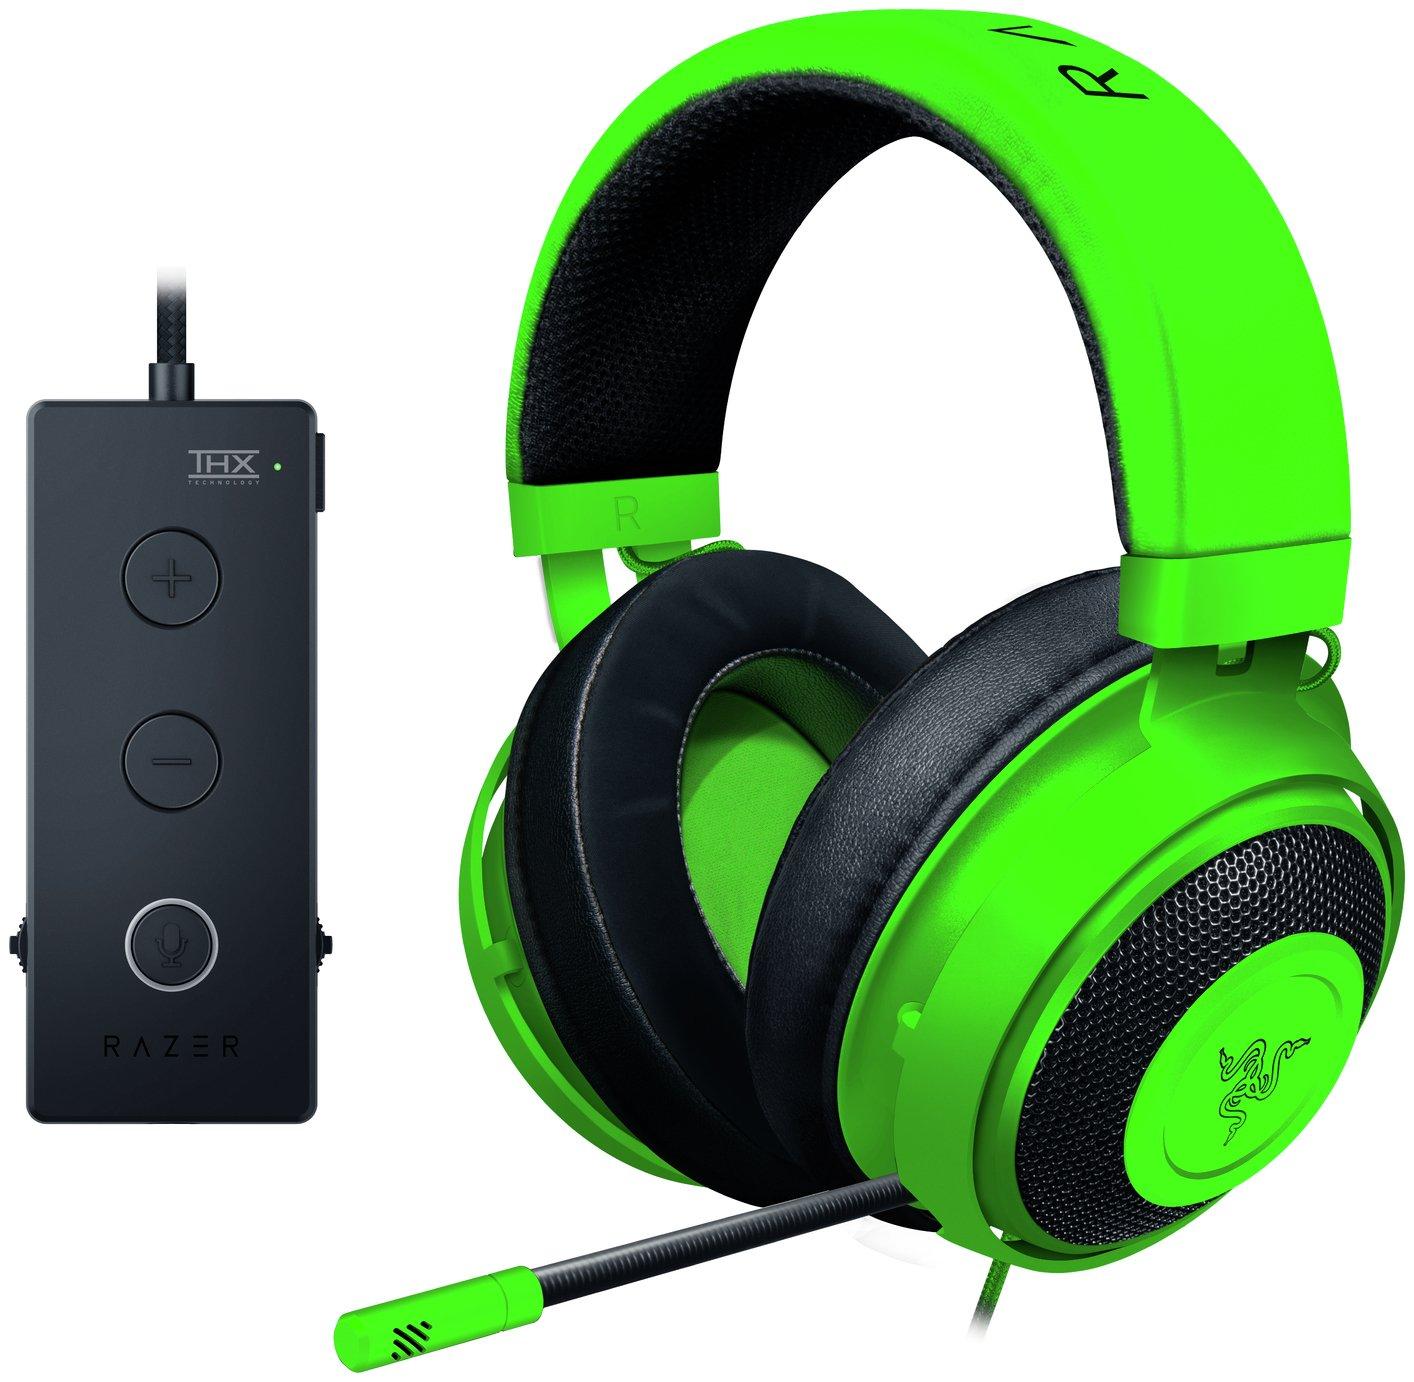 Razer Kraken Tournament Gaming Headset - Green